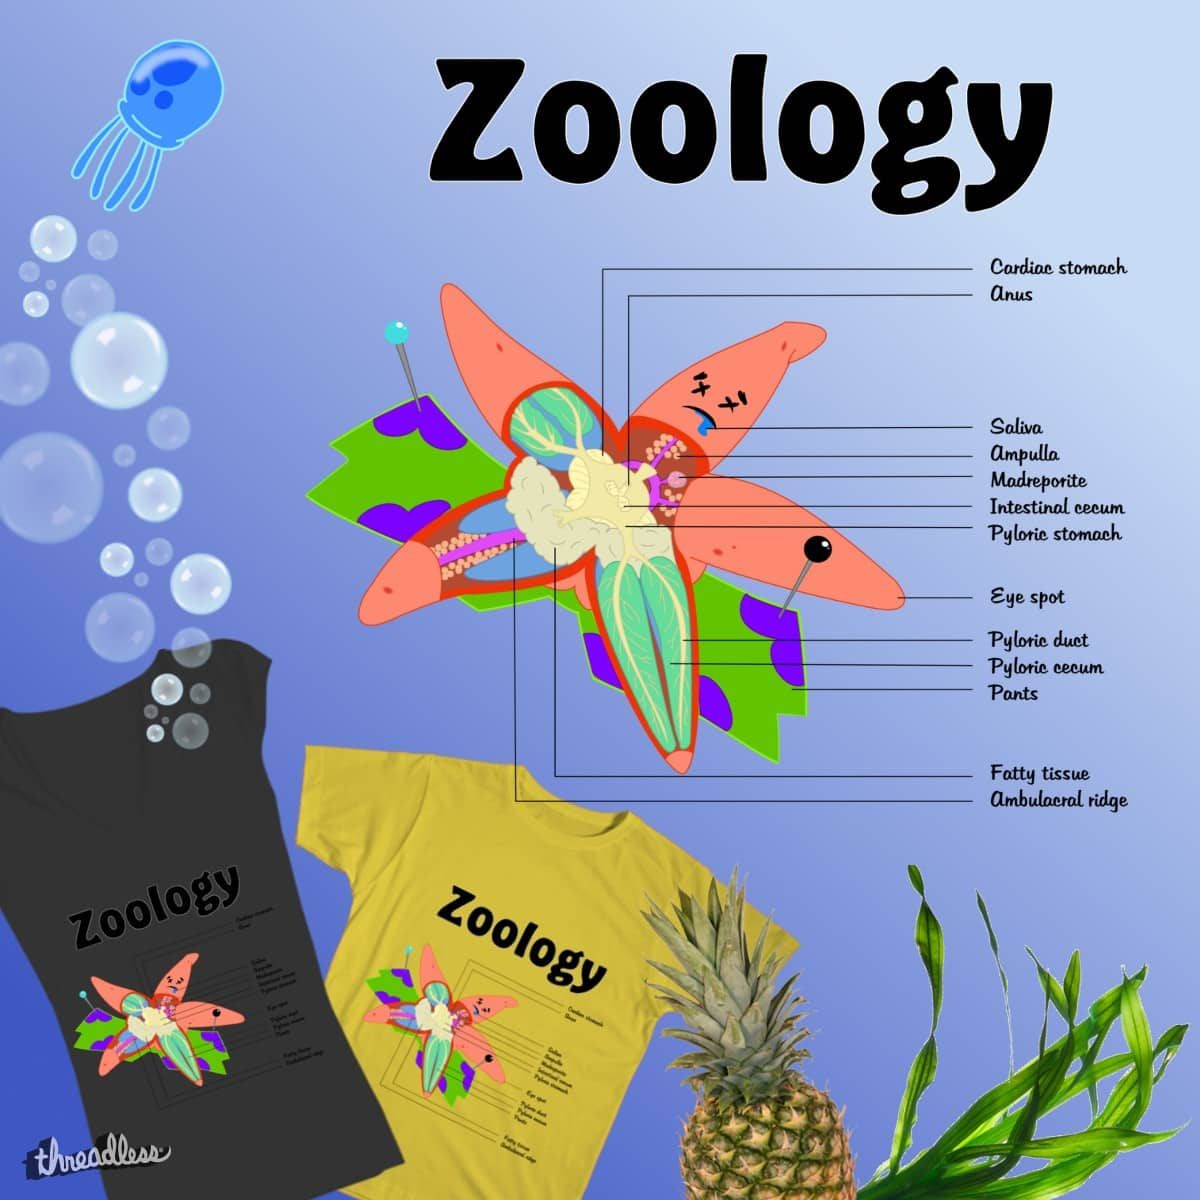 Zoology of Patrick Star by Kipke on Threadless